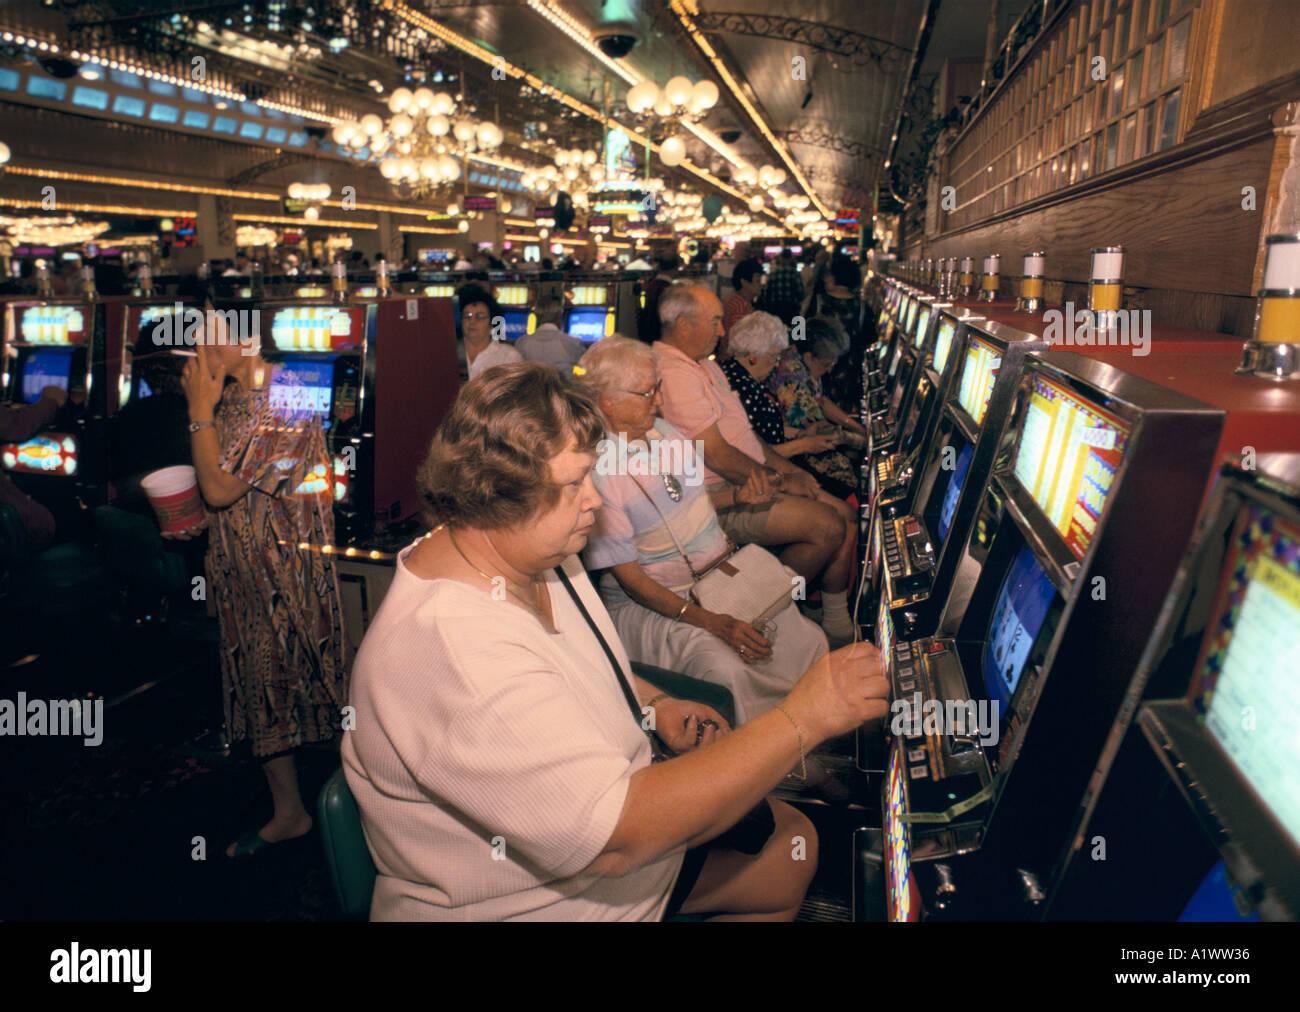 doubling method roulette